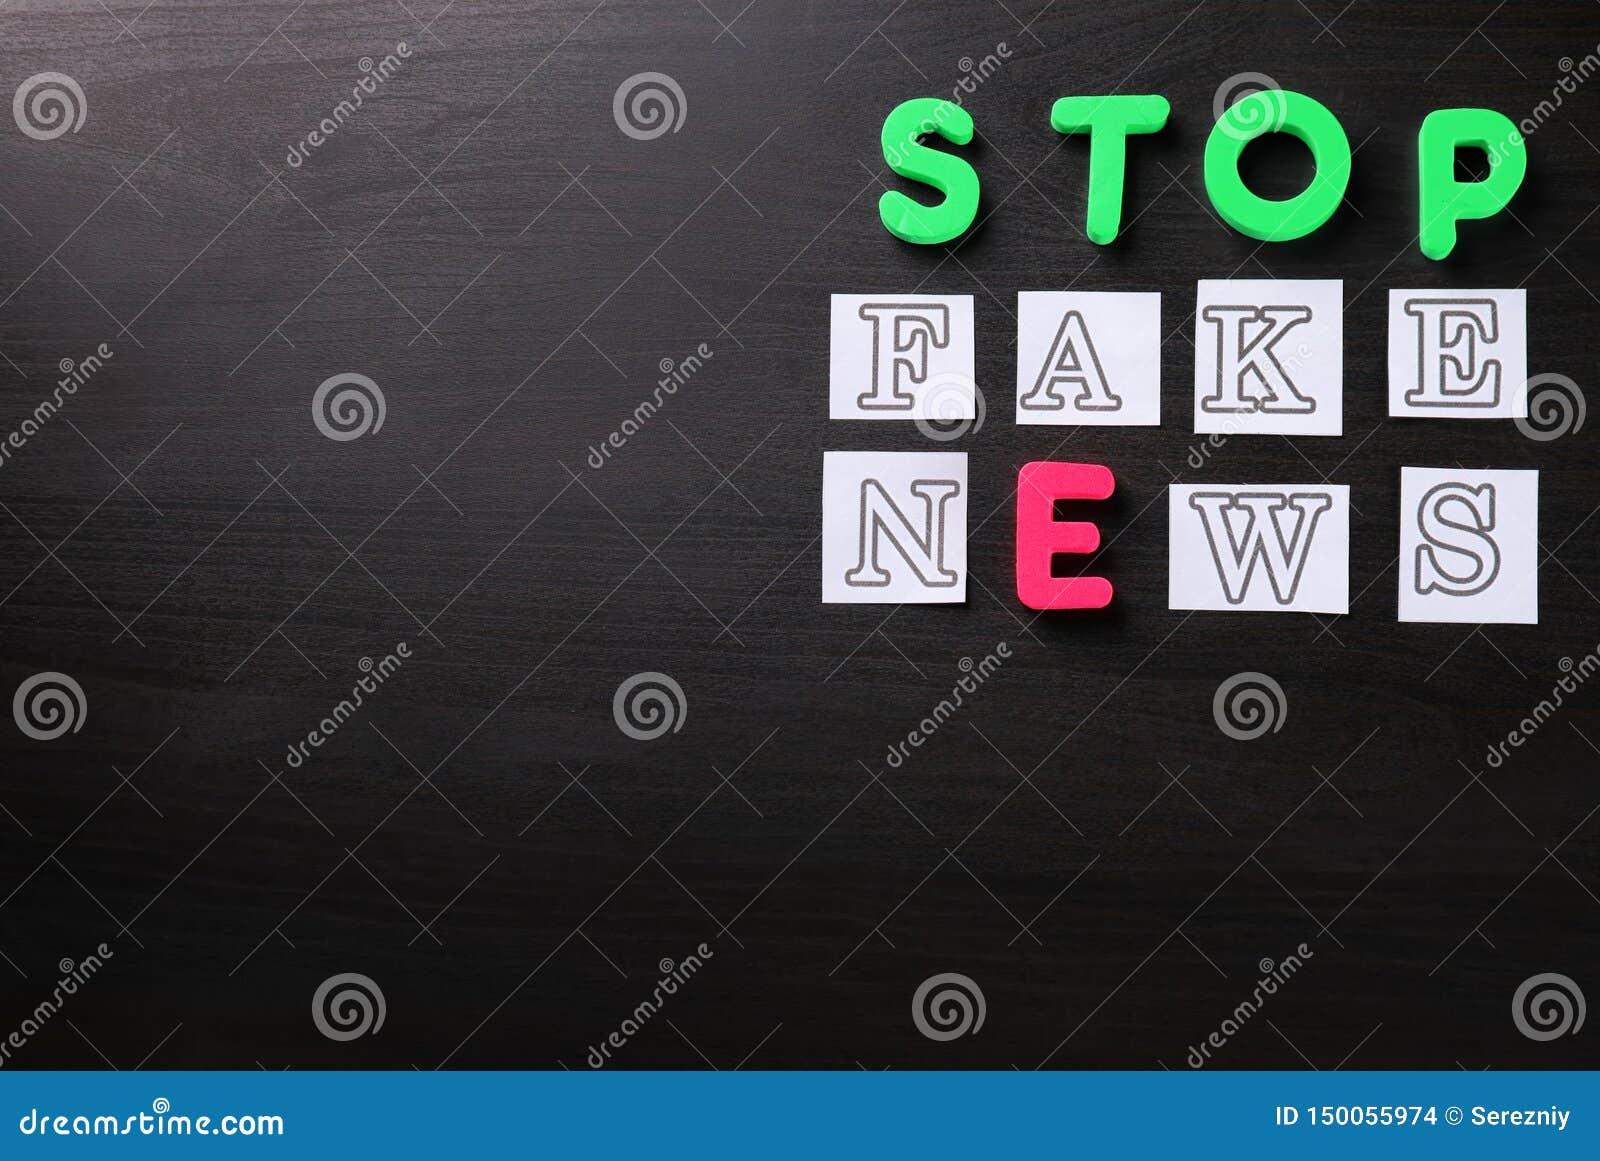 Text STOP FAKE NEWS on dark background